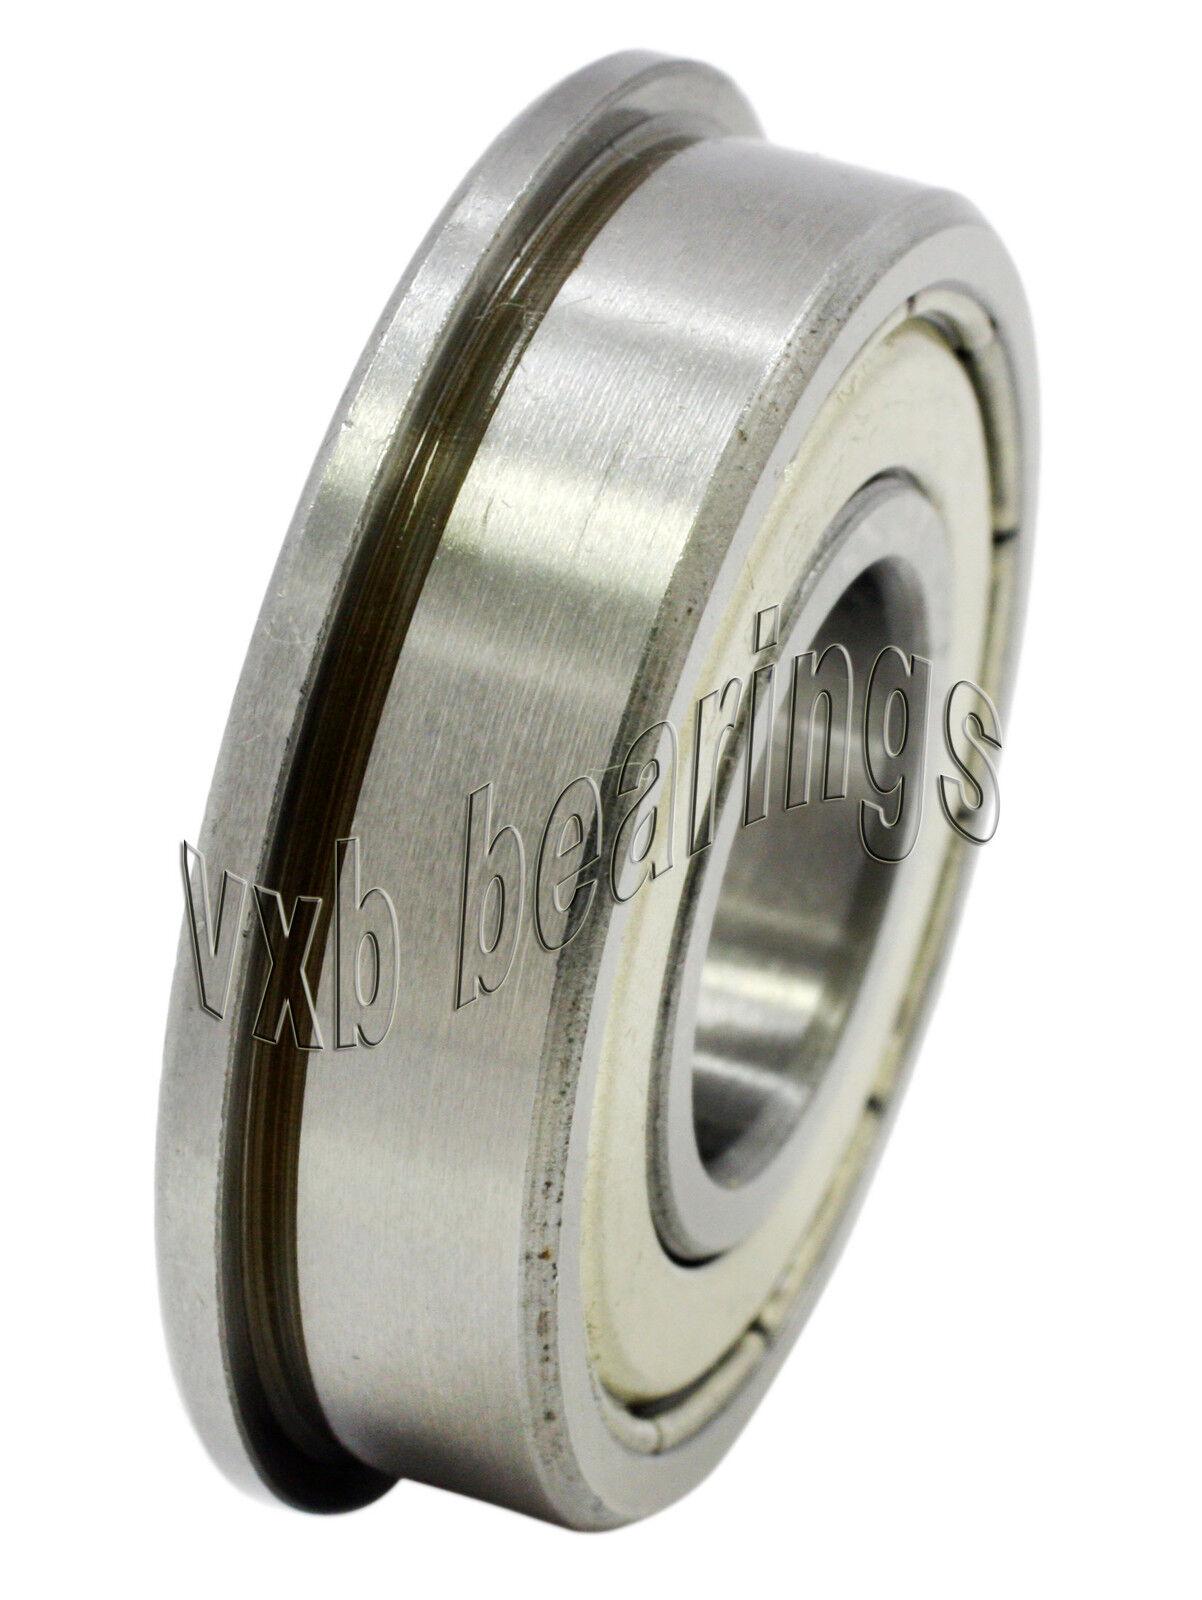 8x24x8 mm 440c Stainless Steel Ball Bearing Bearings 628ZZ QTY 5 S628ZZ